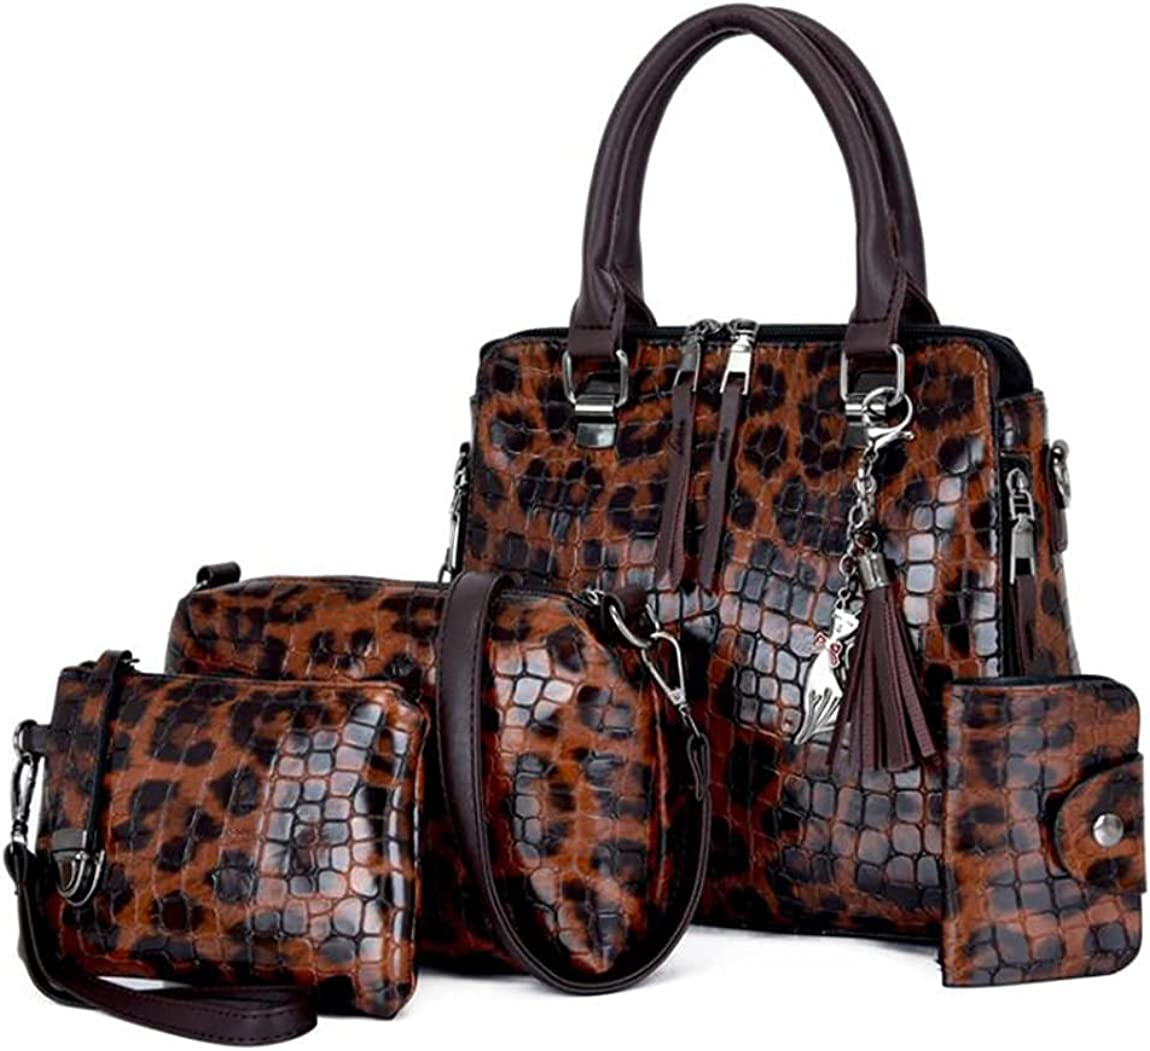 GJGJTER Synthetic PU Leather Tote for Women 4PCS atchel Crossbody Hobo Top-Handle Handbags Premium Adjustable Strap